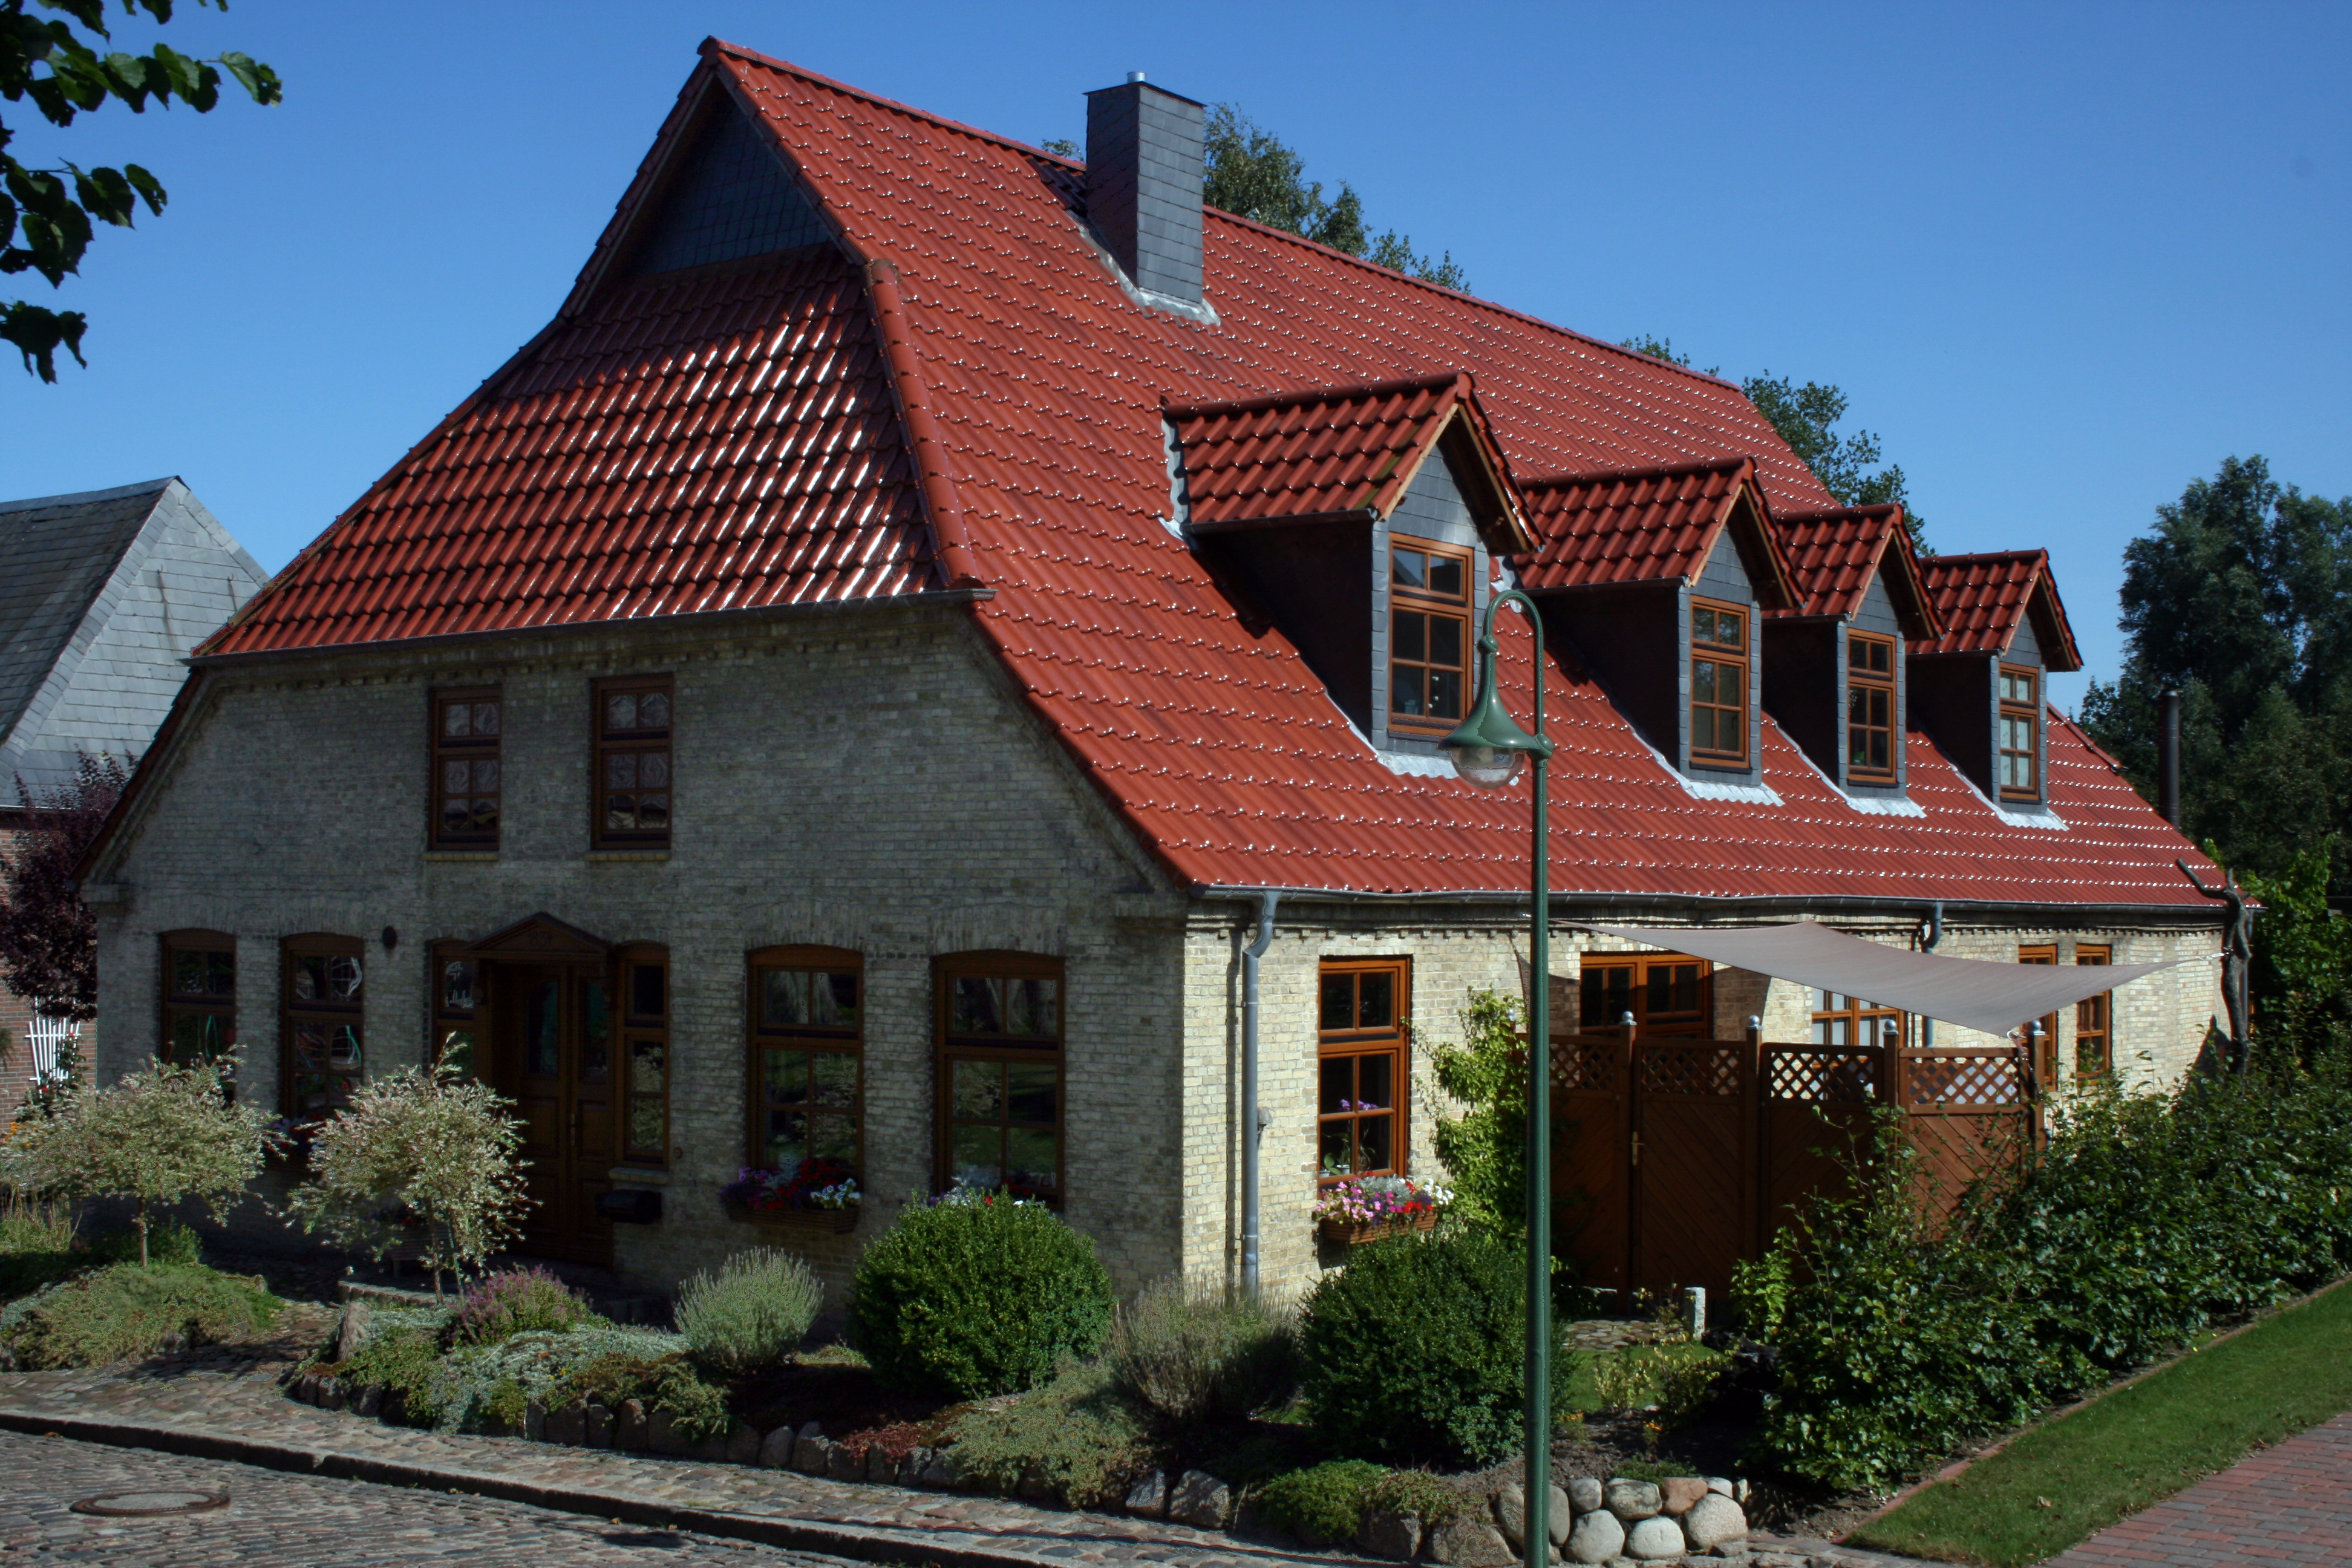 Dutch Gable Roof Wikipedia